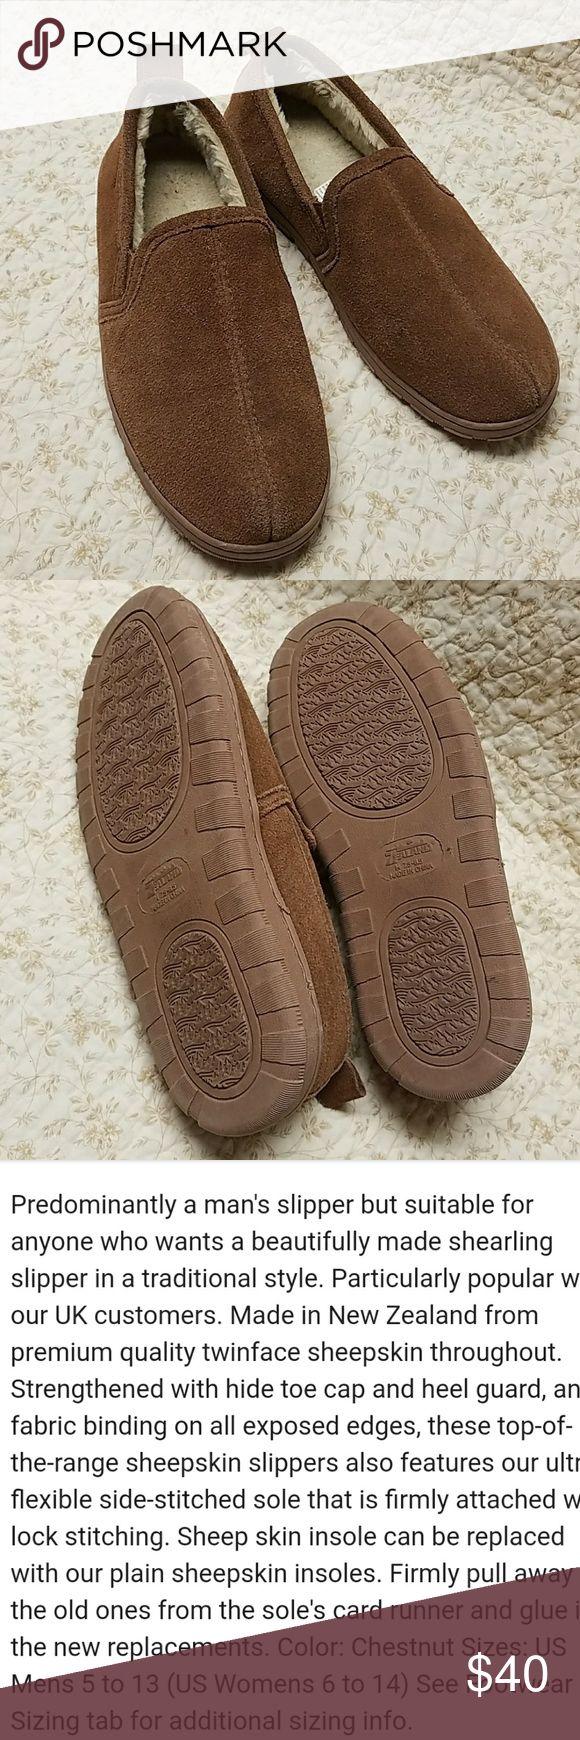 Zealand sheepskin mens slippers, sz 7.5-8.5, brown Zealand sheepskin mens slippers, size 7.5-8.5, brown, gently worn...very nice. Zealand  Shoes Slippers